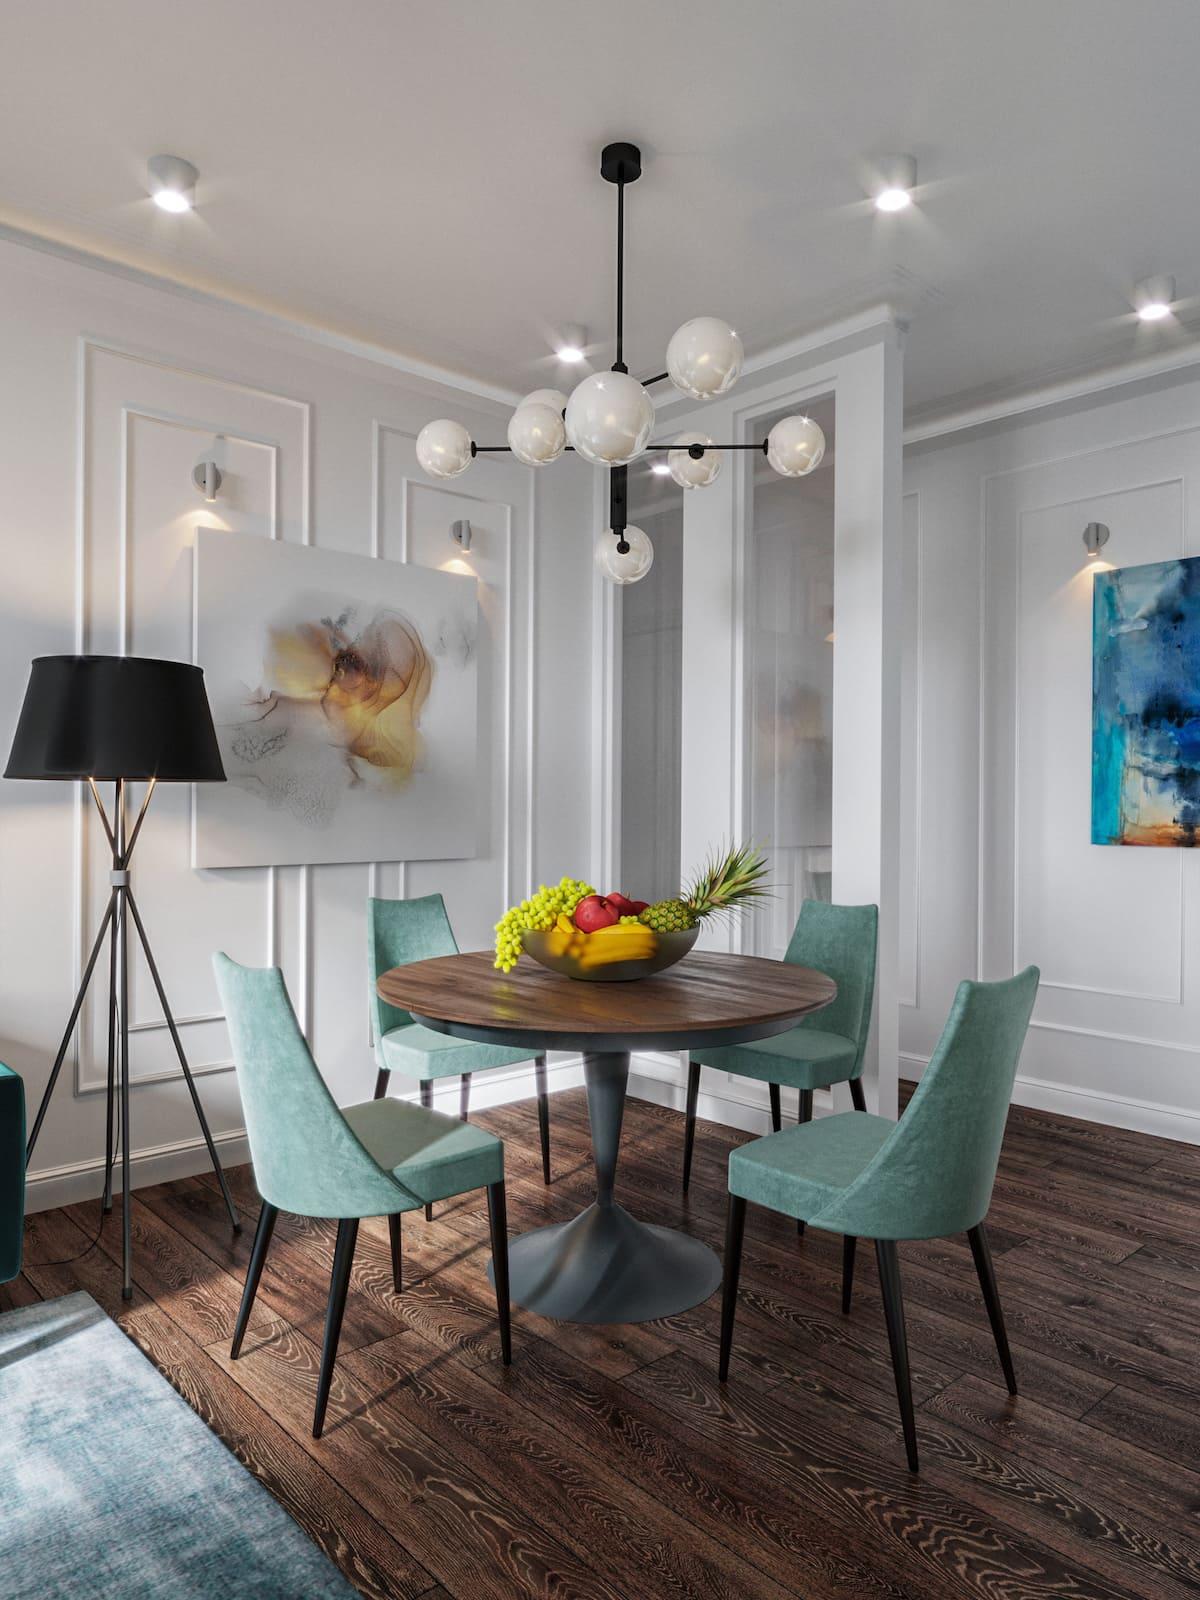 дизайн интерьера модной квартиры фото 34